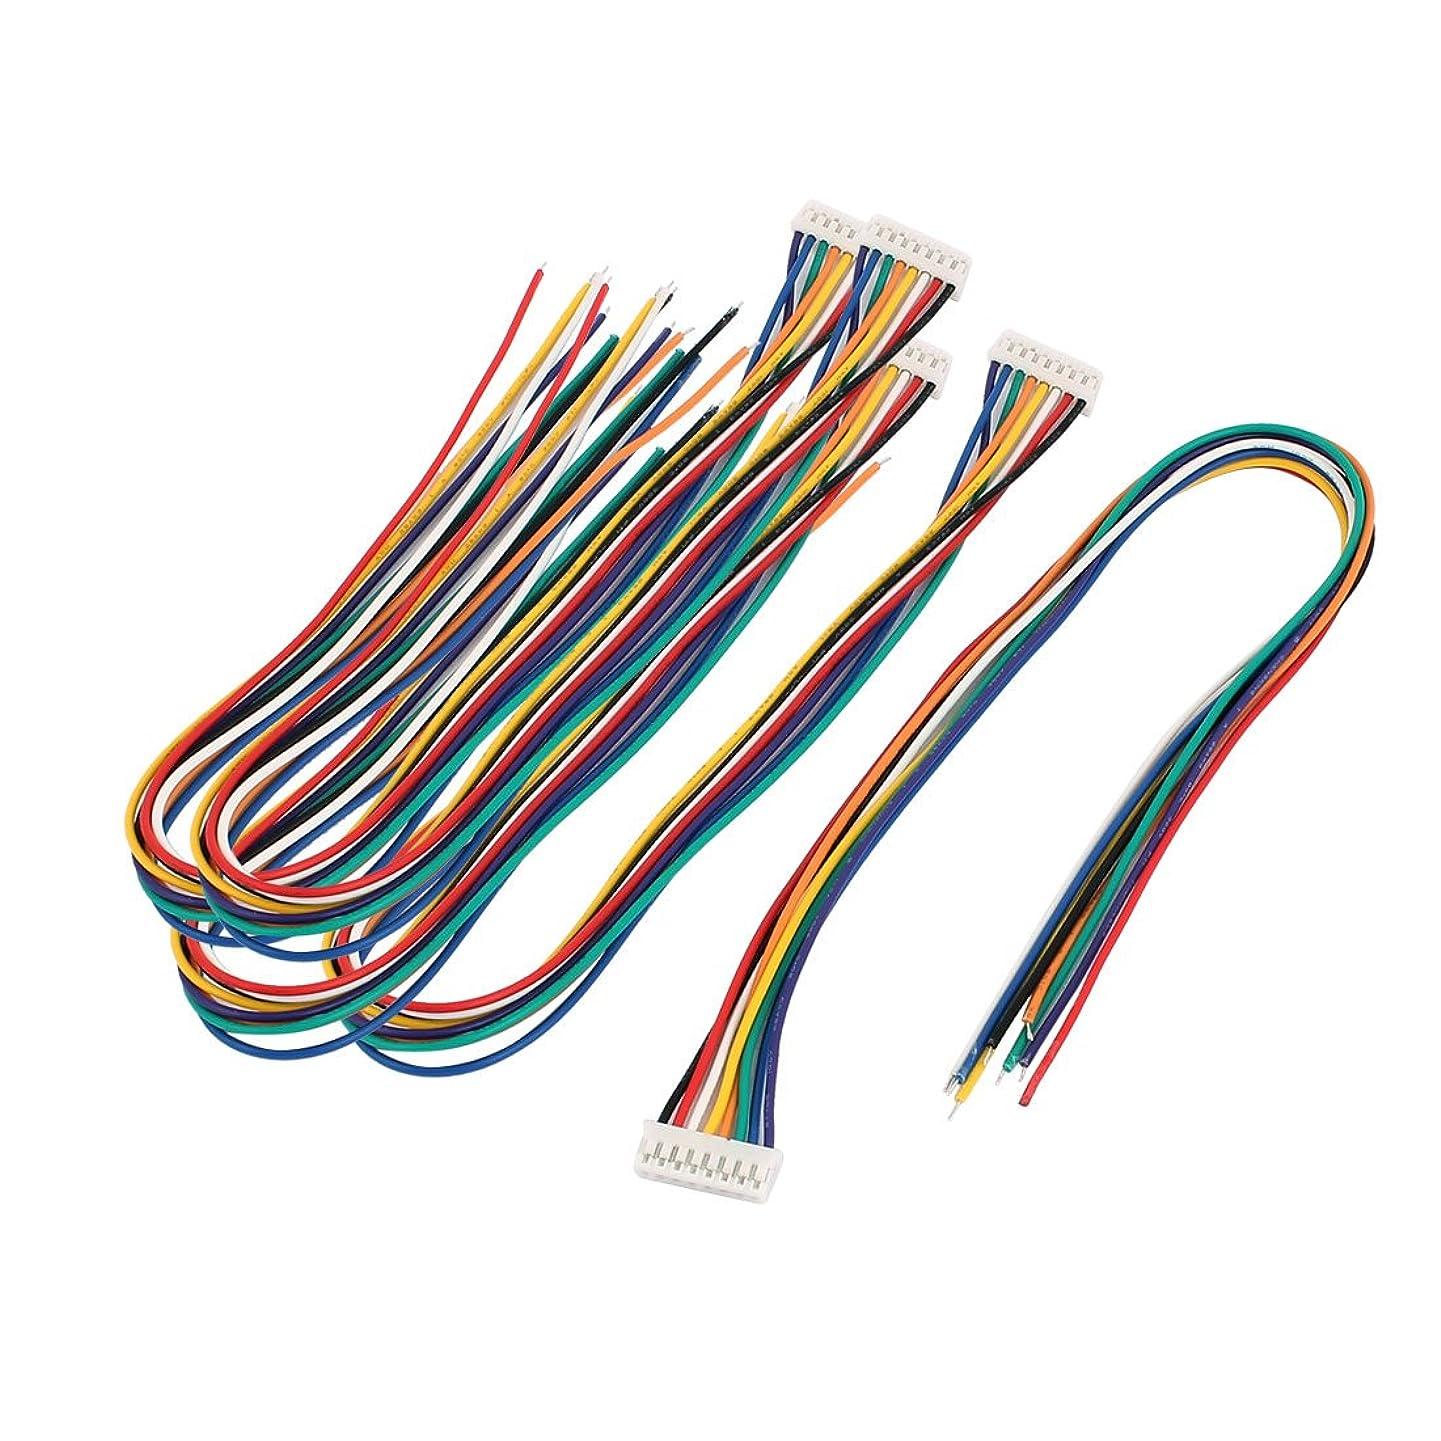 uxcell 5 Pcs Single End 8P PH2.0 Balance Connector Extension Wire 30cm Multi-Color